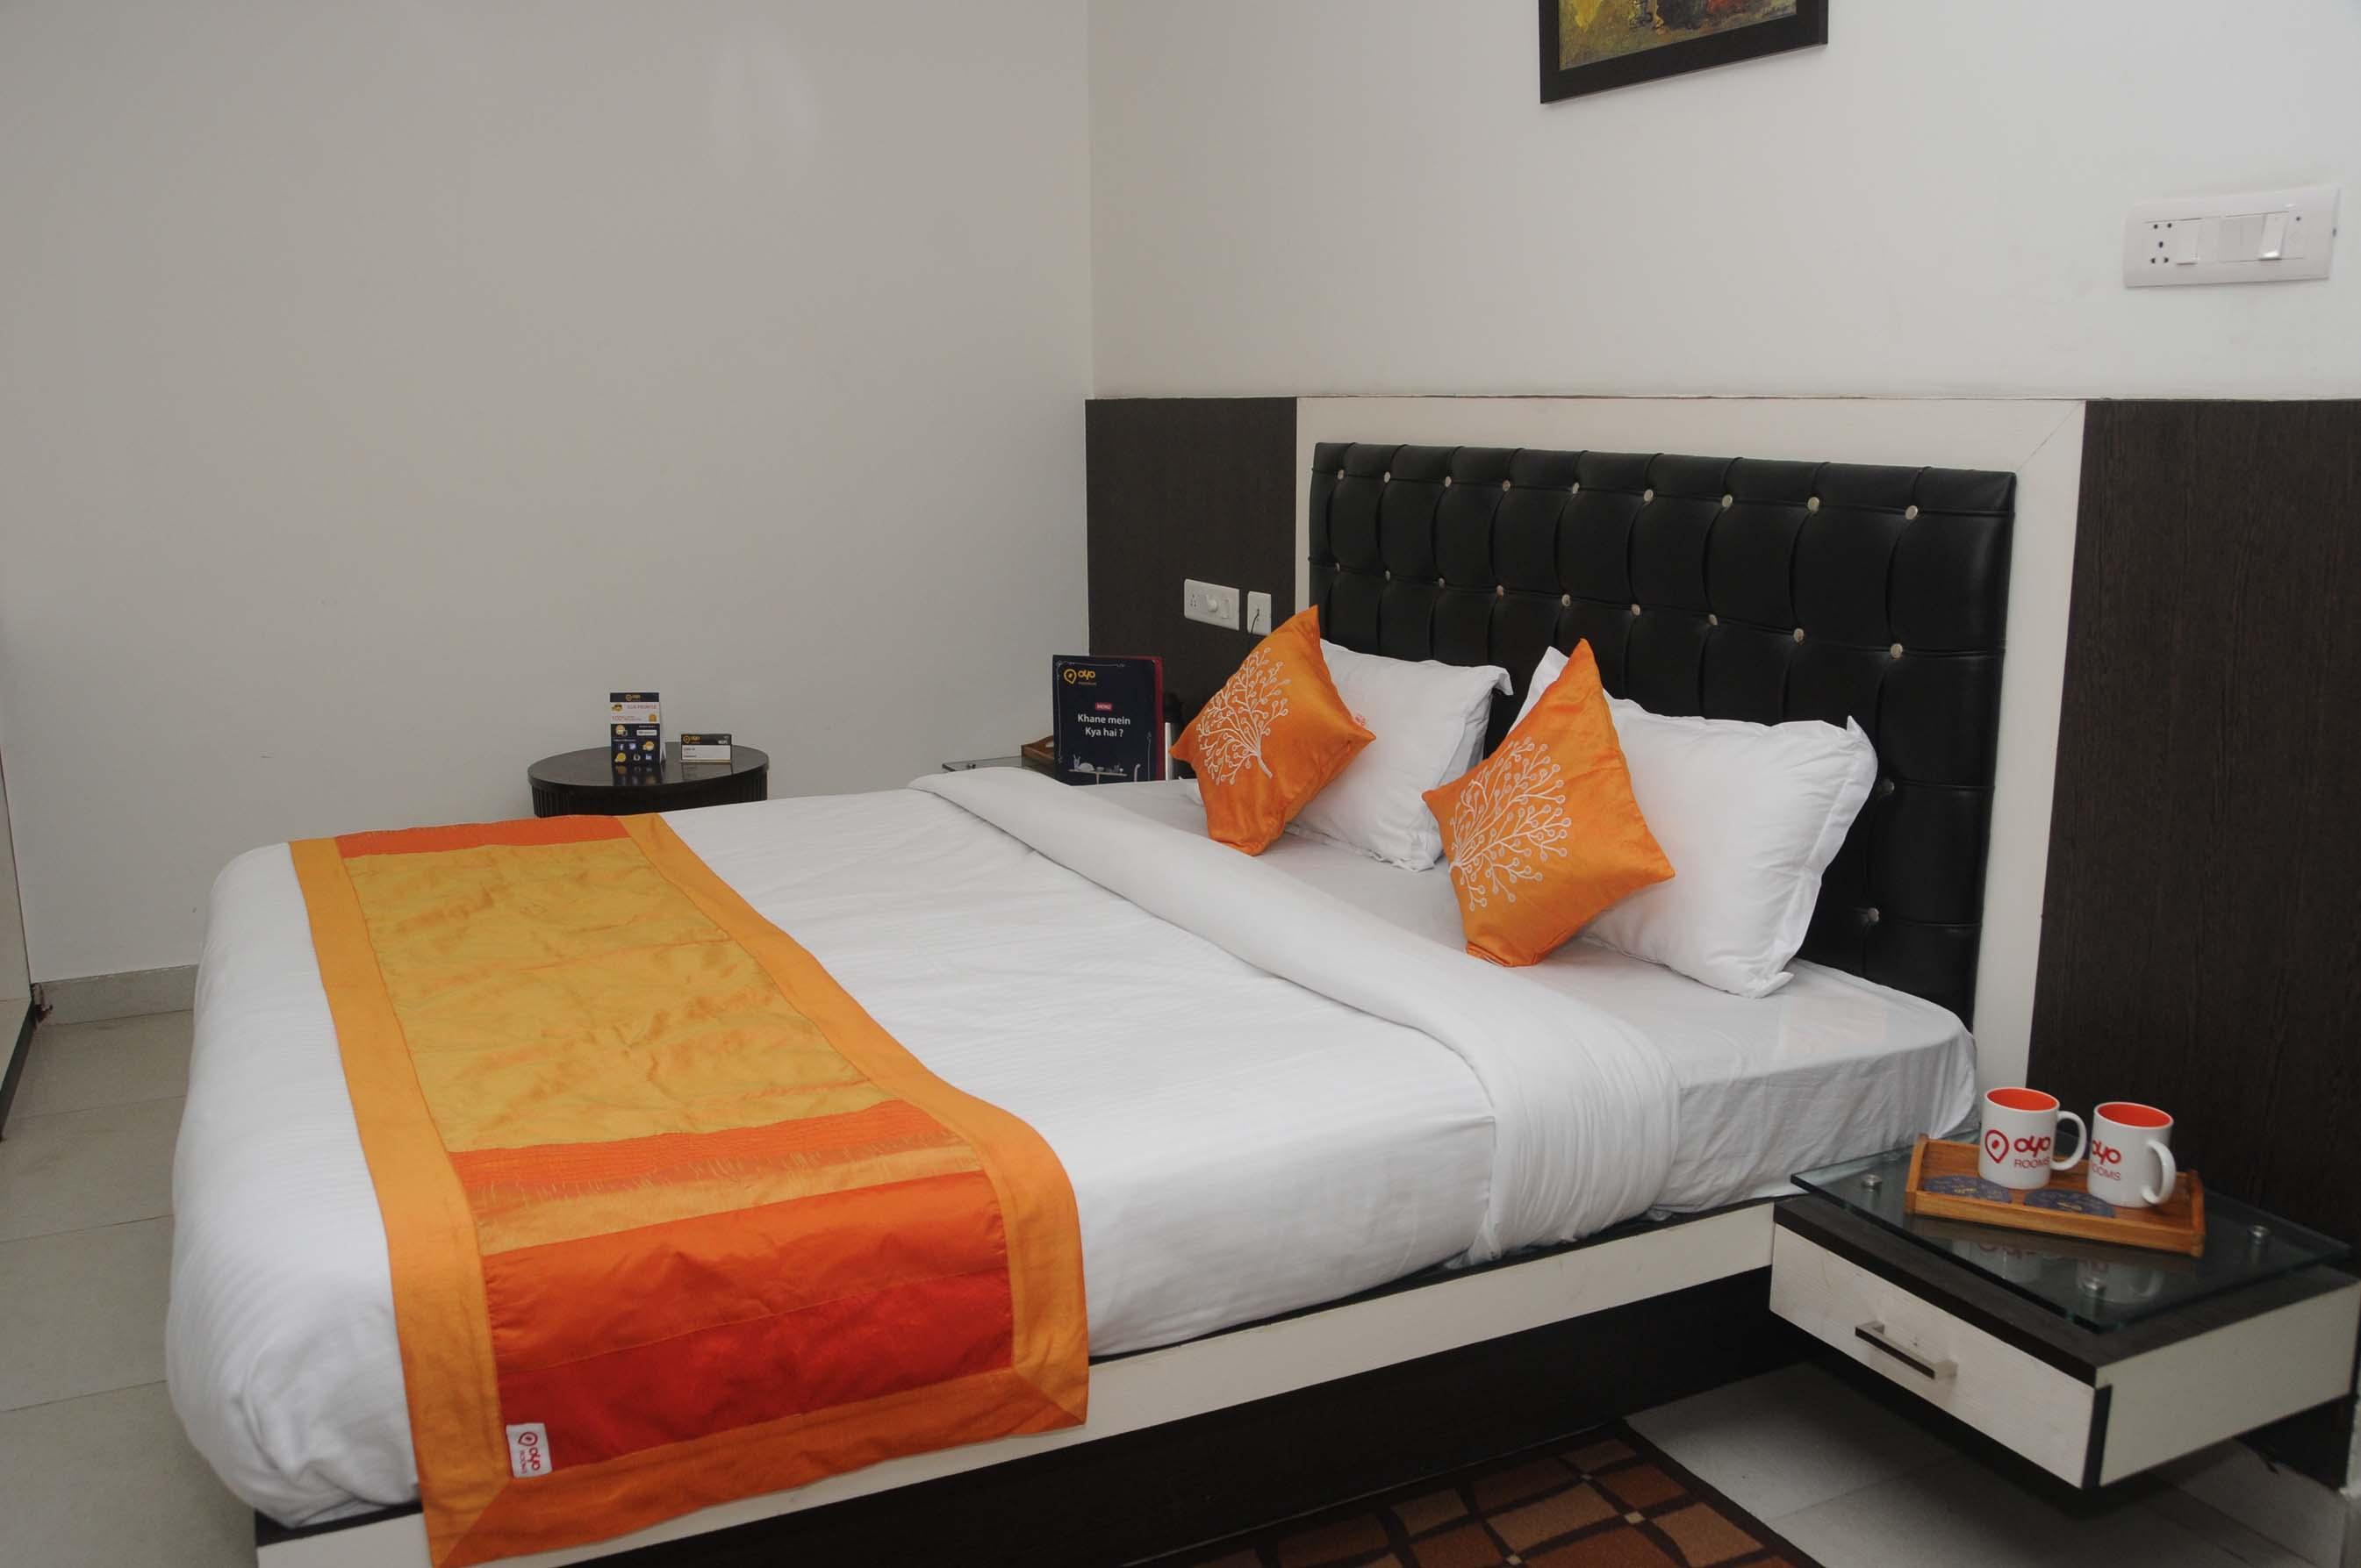 OYO 3123 IRIS Business Hotel in Danapur